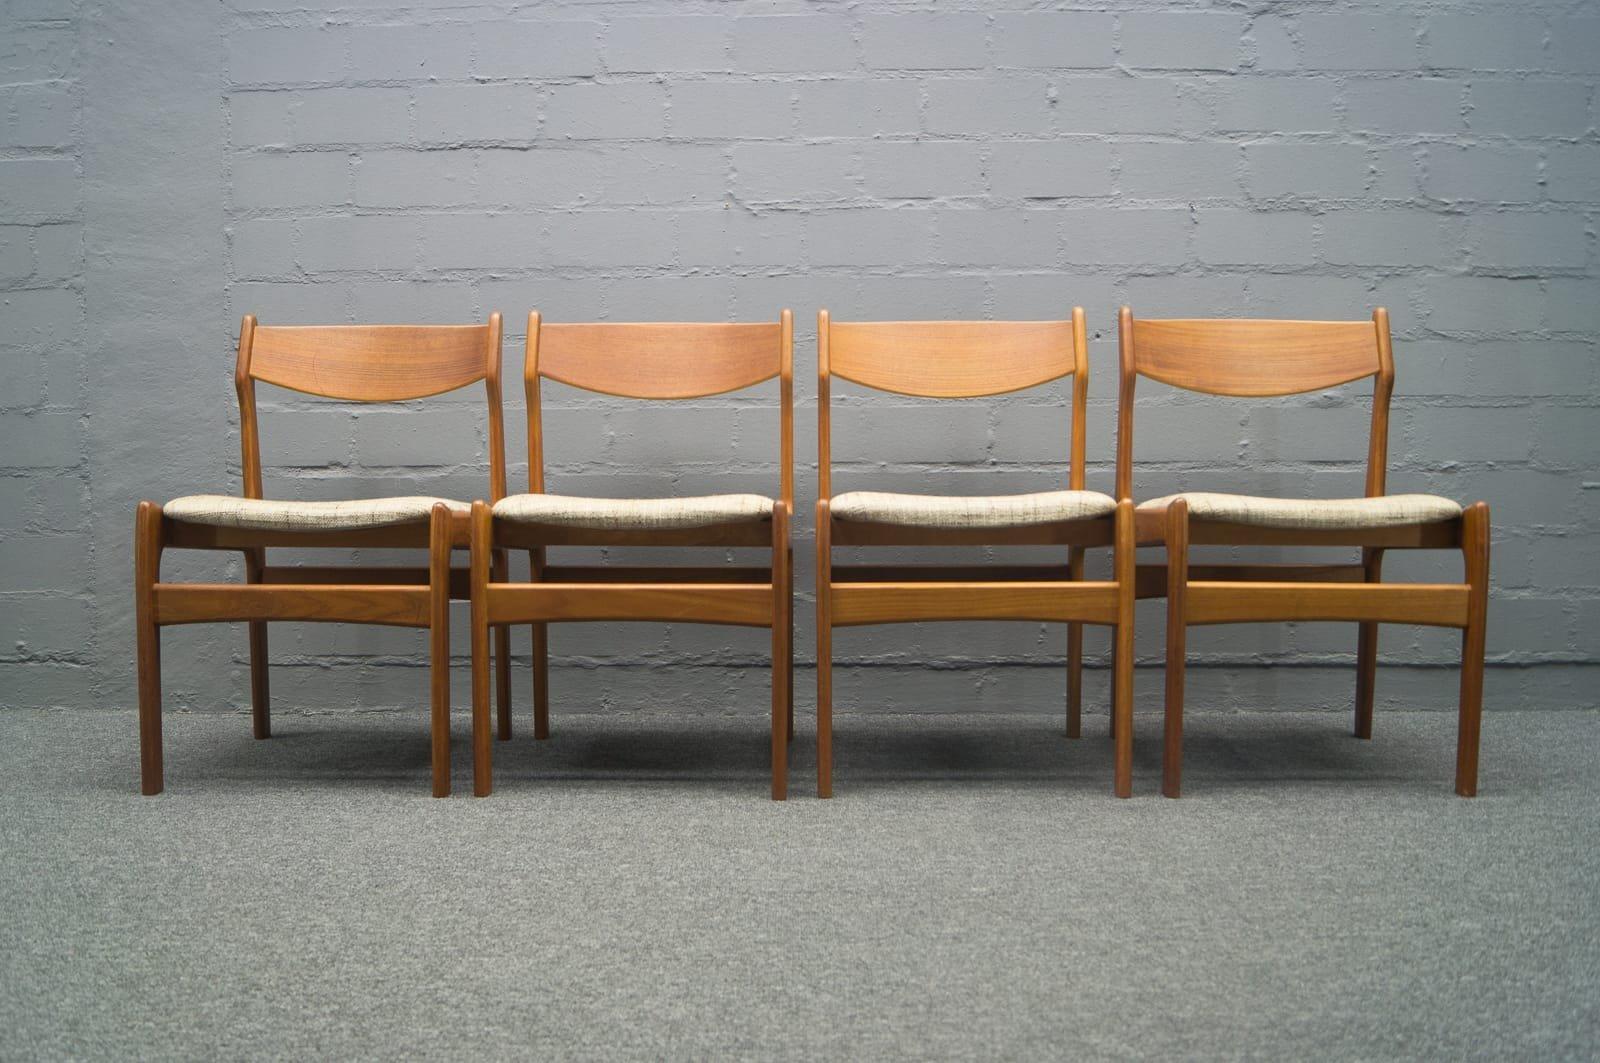 set of four swedish midcentury modern teak dining chairs 2